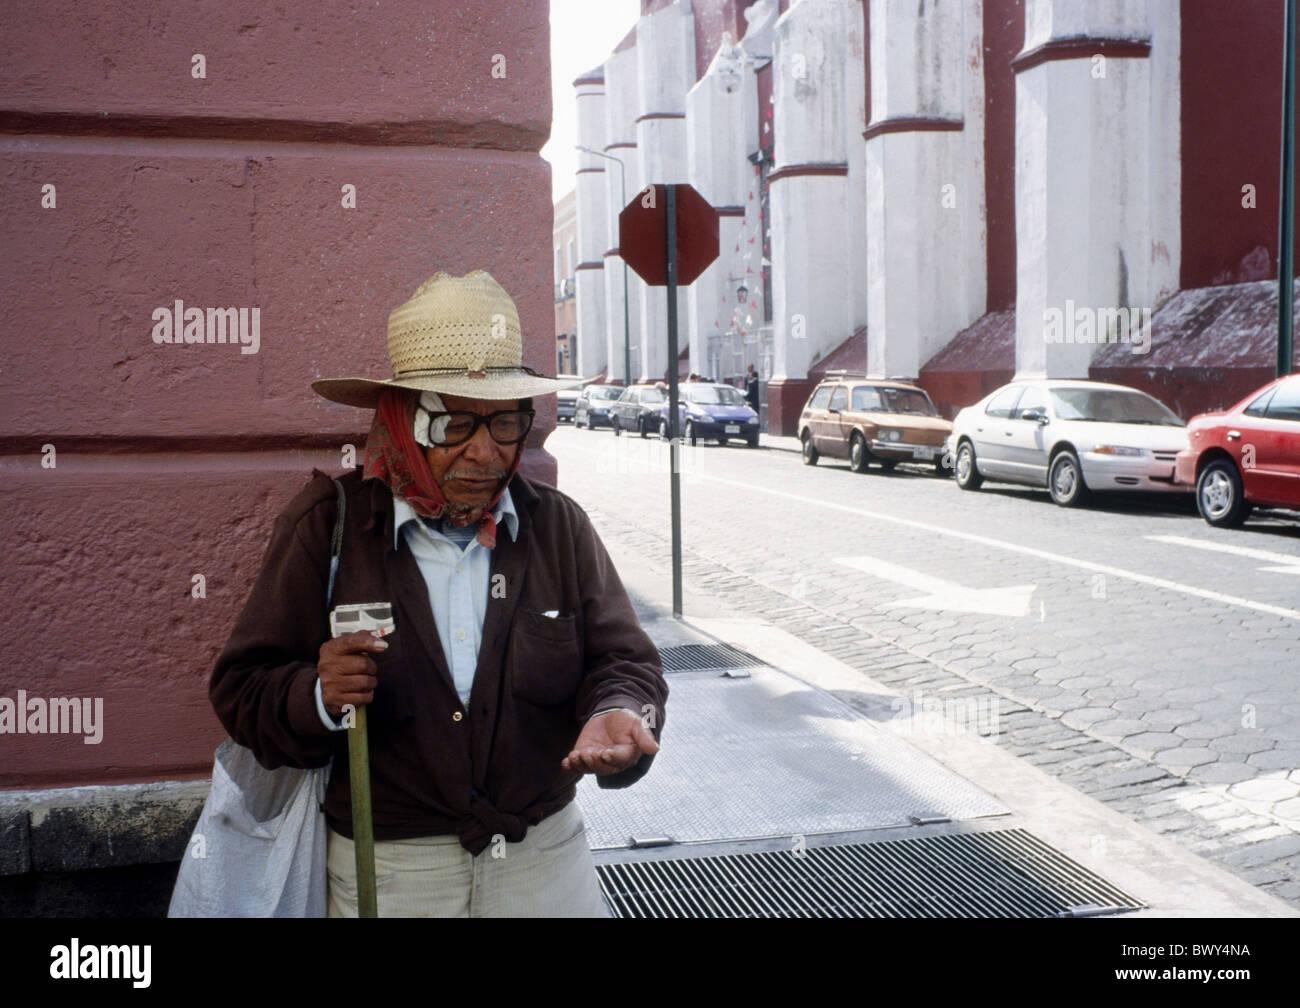 Armut betteln Bettler Bum Brille Hut Mexiko Mittelamerika ...